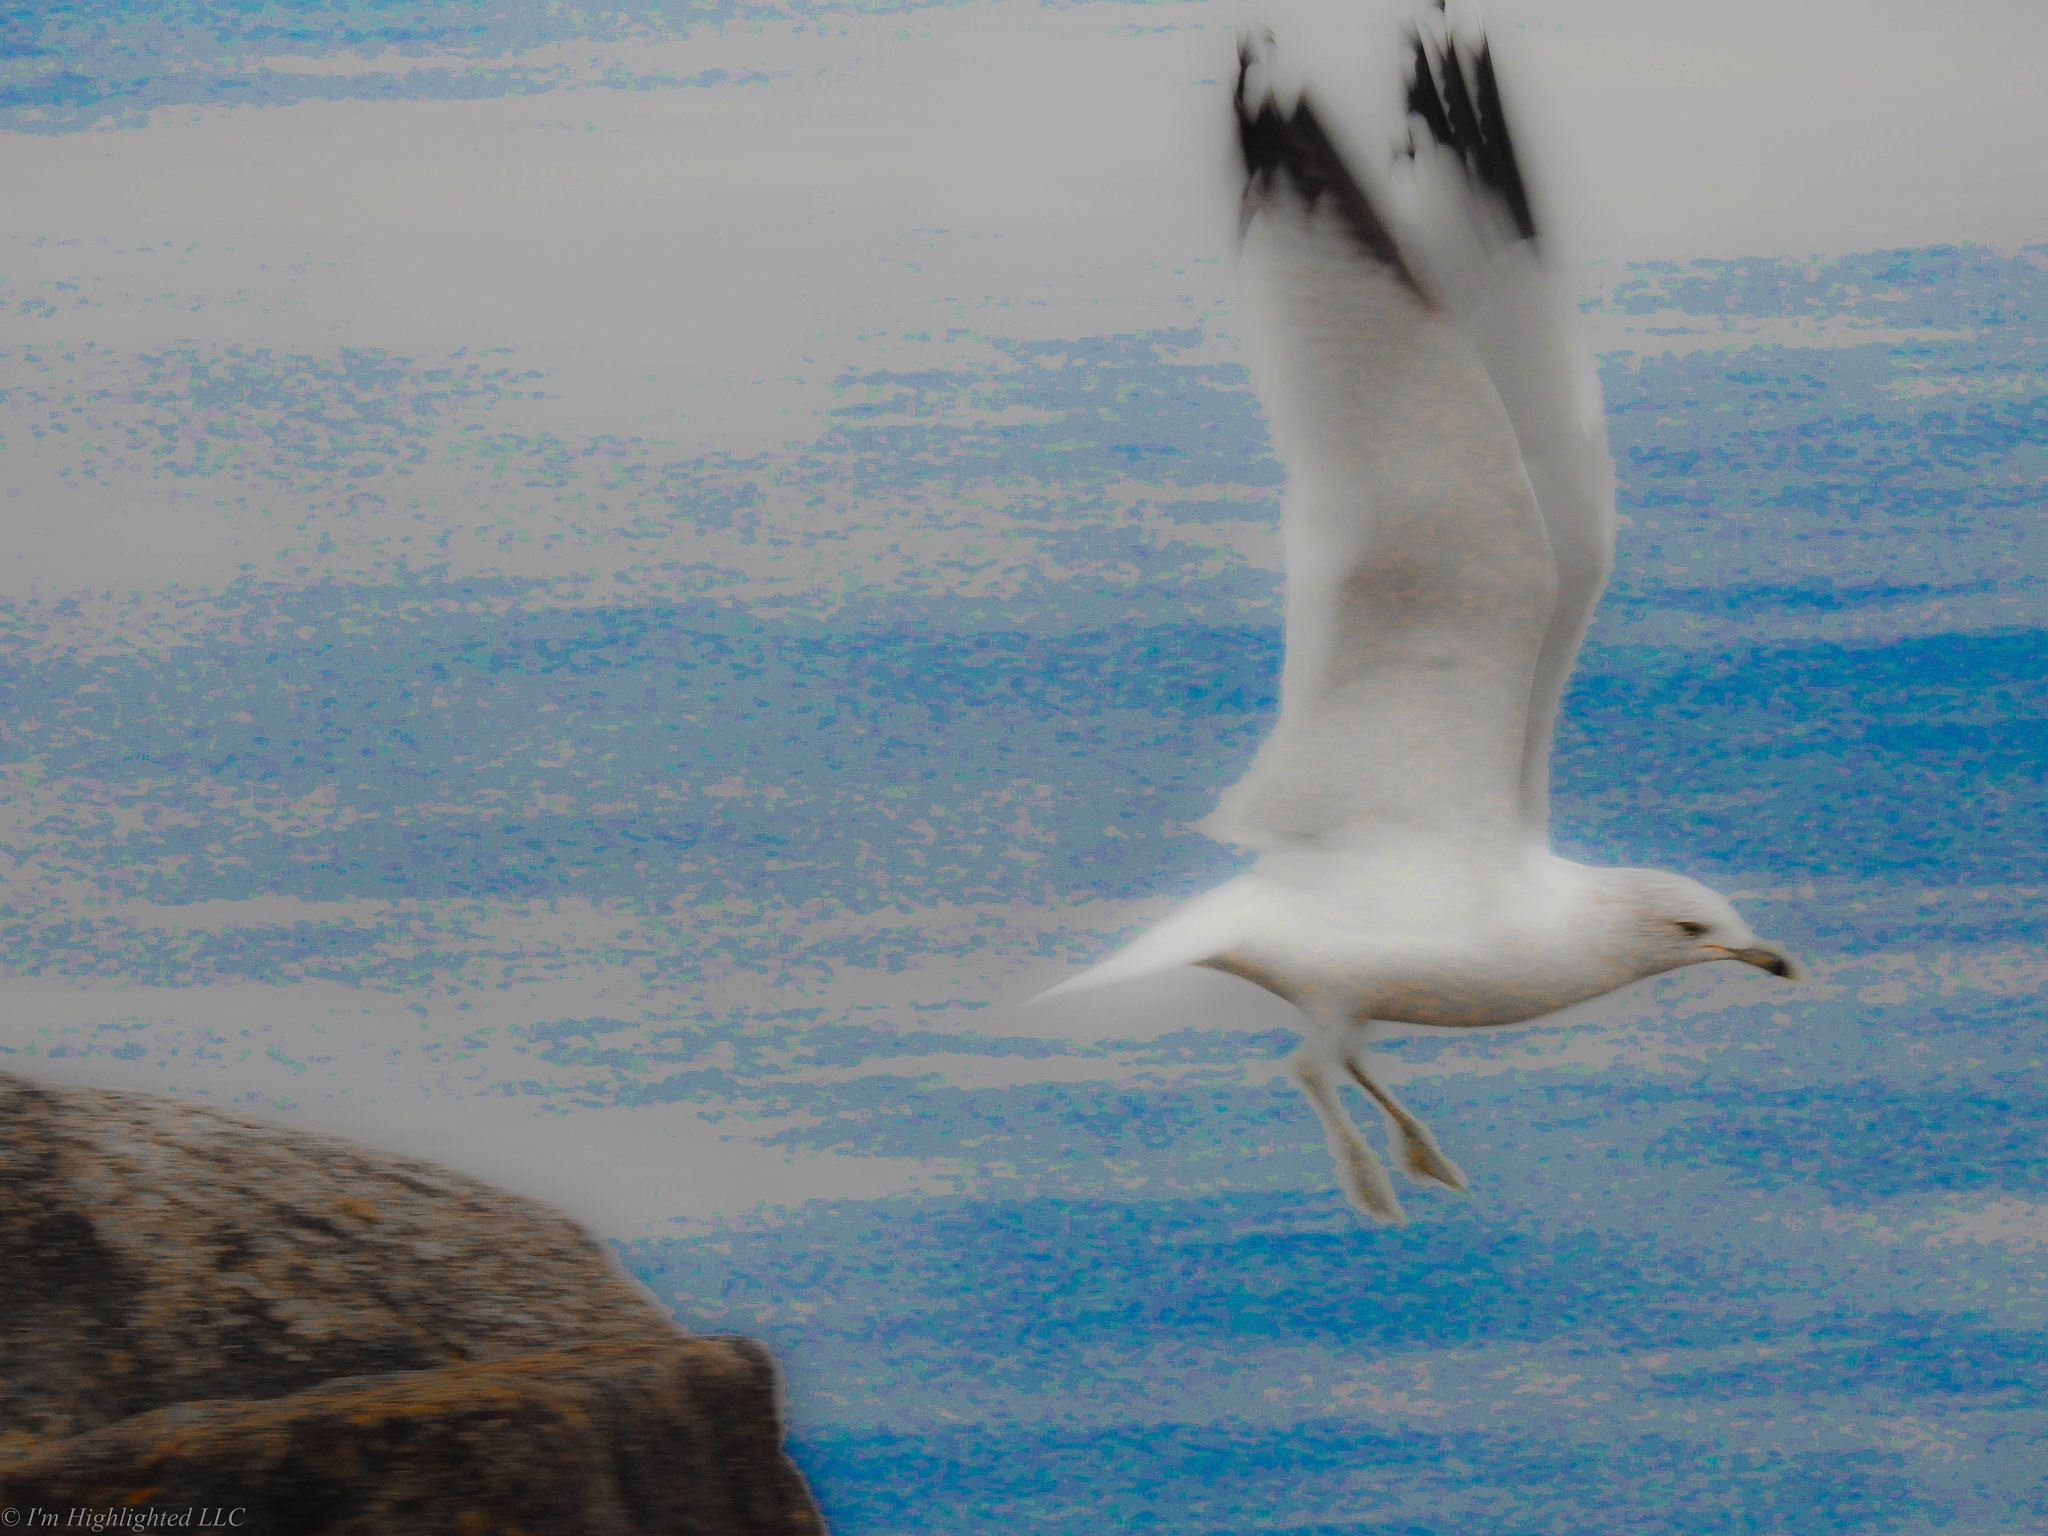 Take off! by Samantha